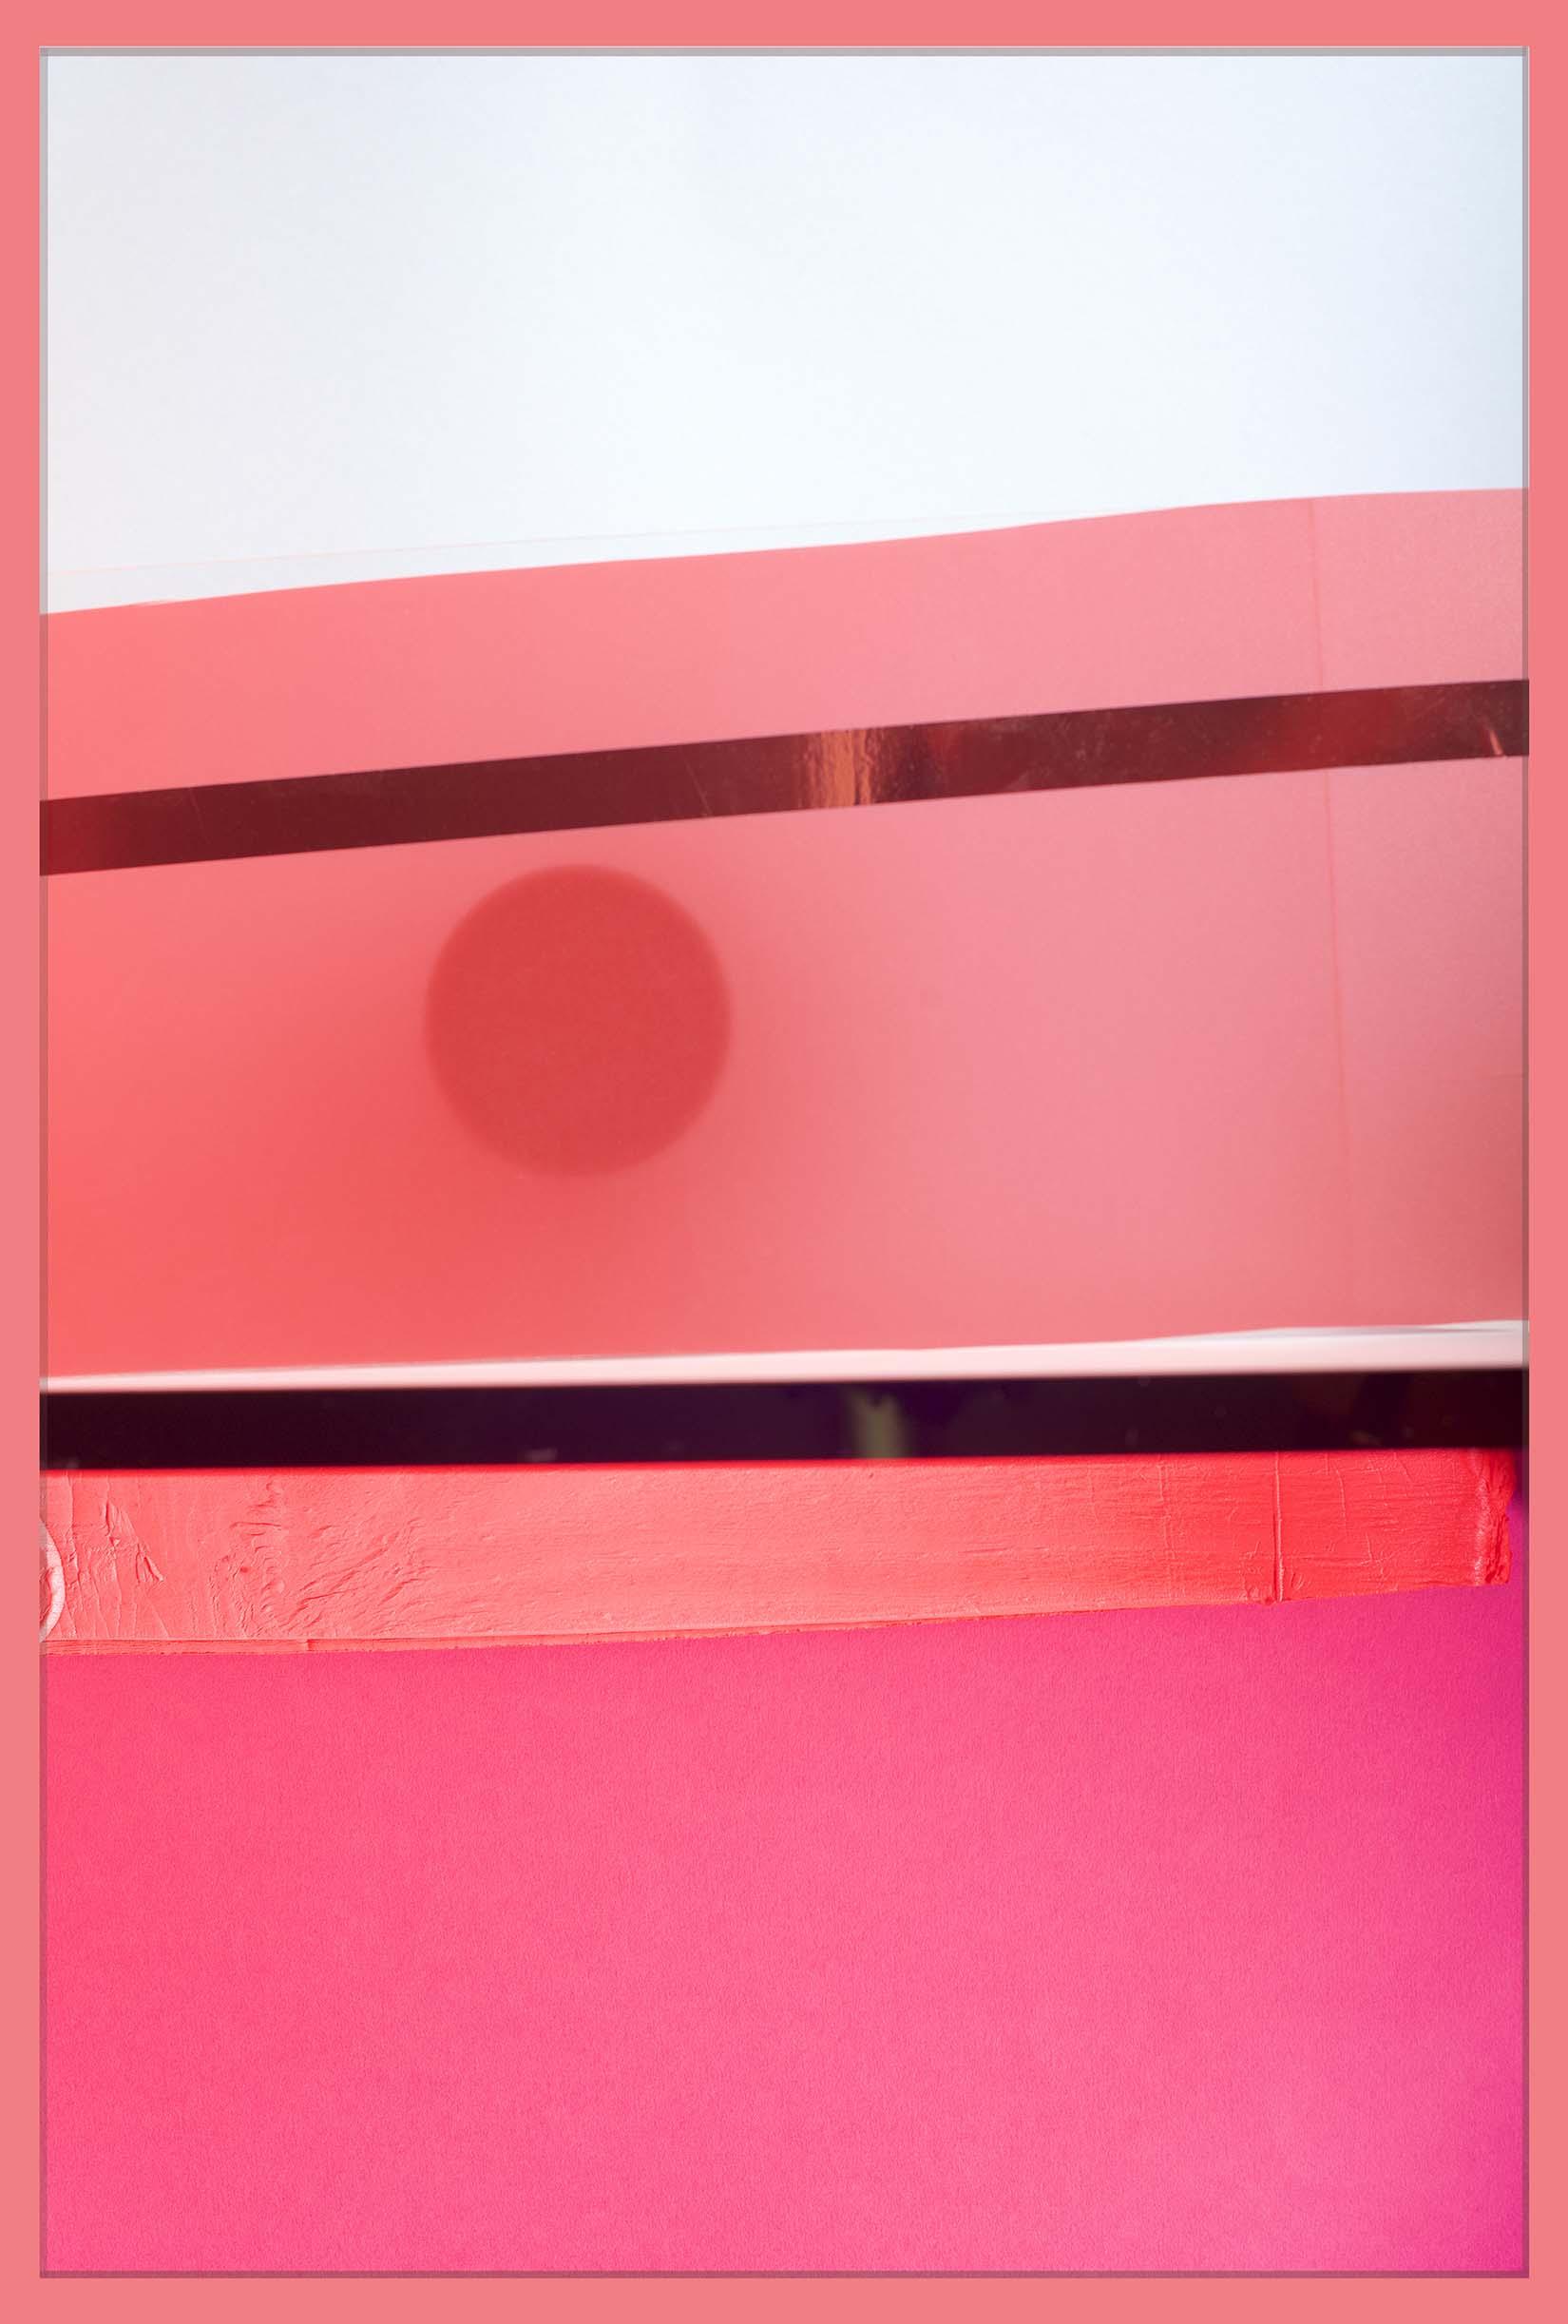 LYDIA WEGNER   Circle Haze  2017 archival inkjet print, edition of 4 80 x 53.5 cm